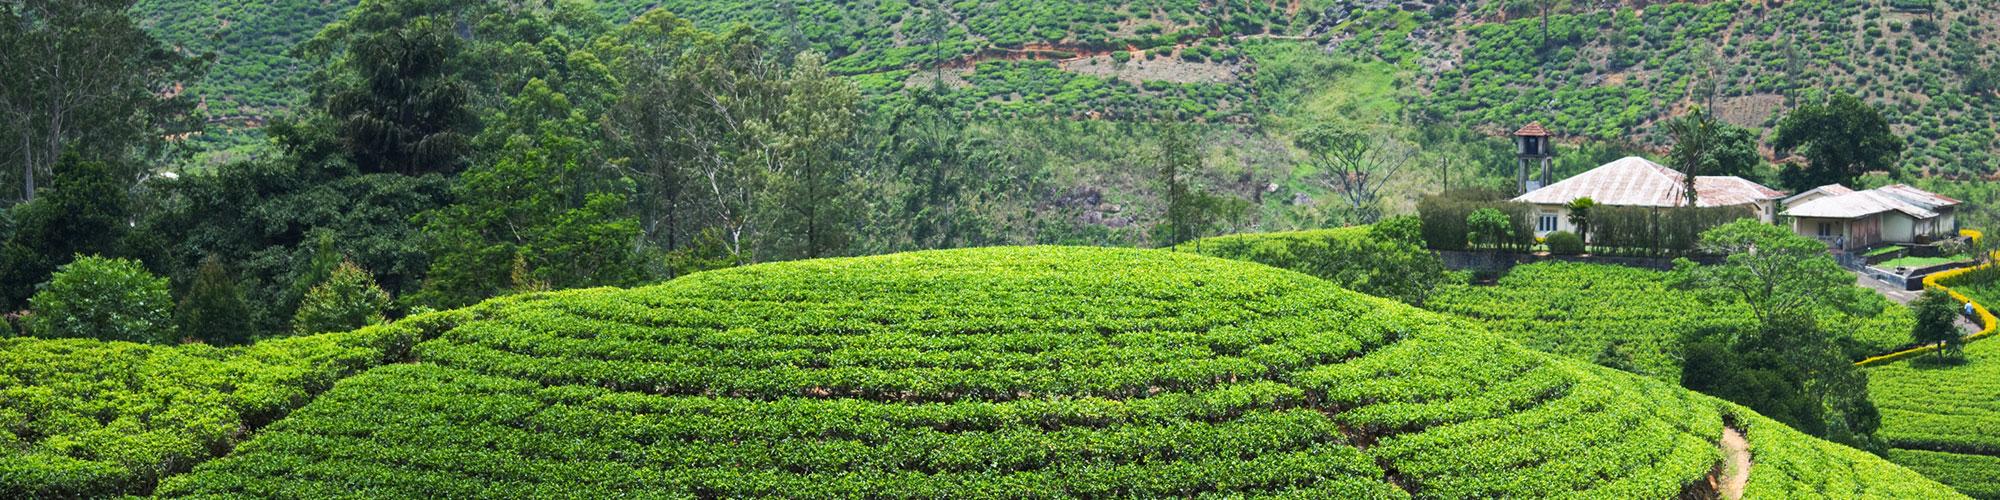 Tea estates and elephants